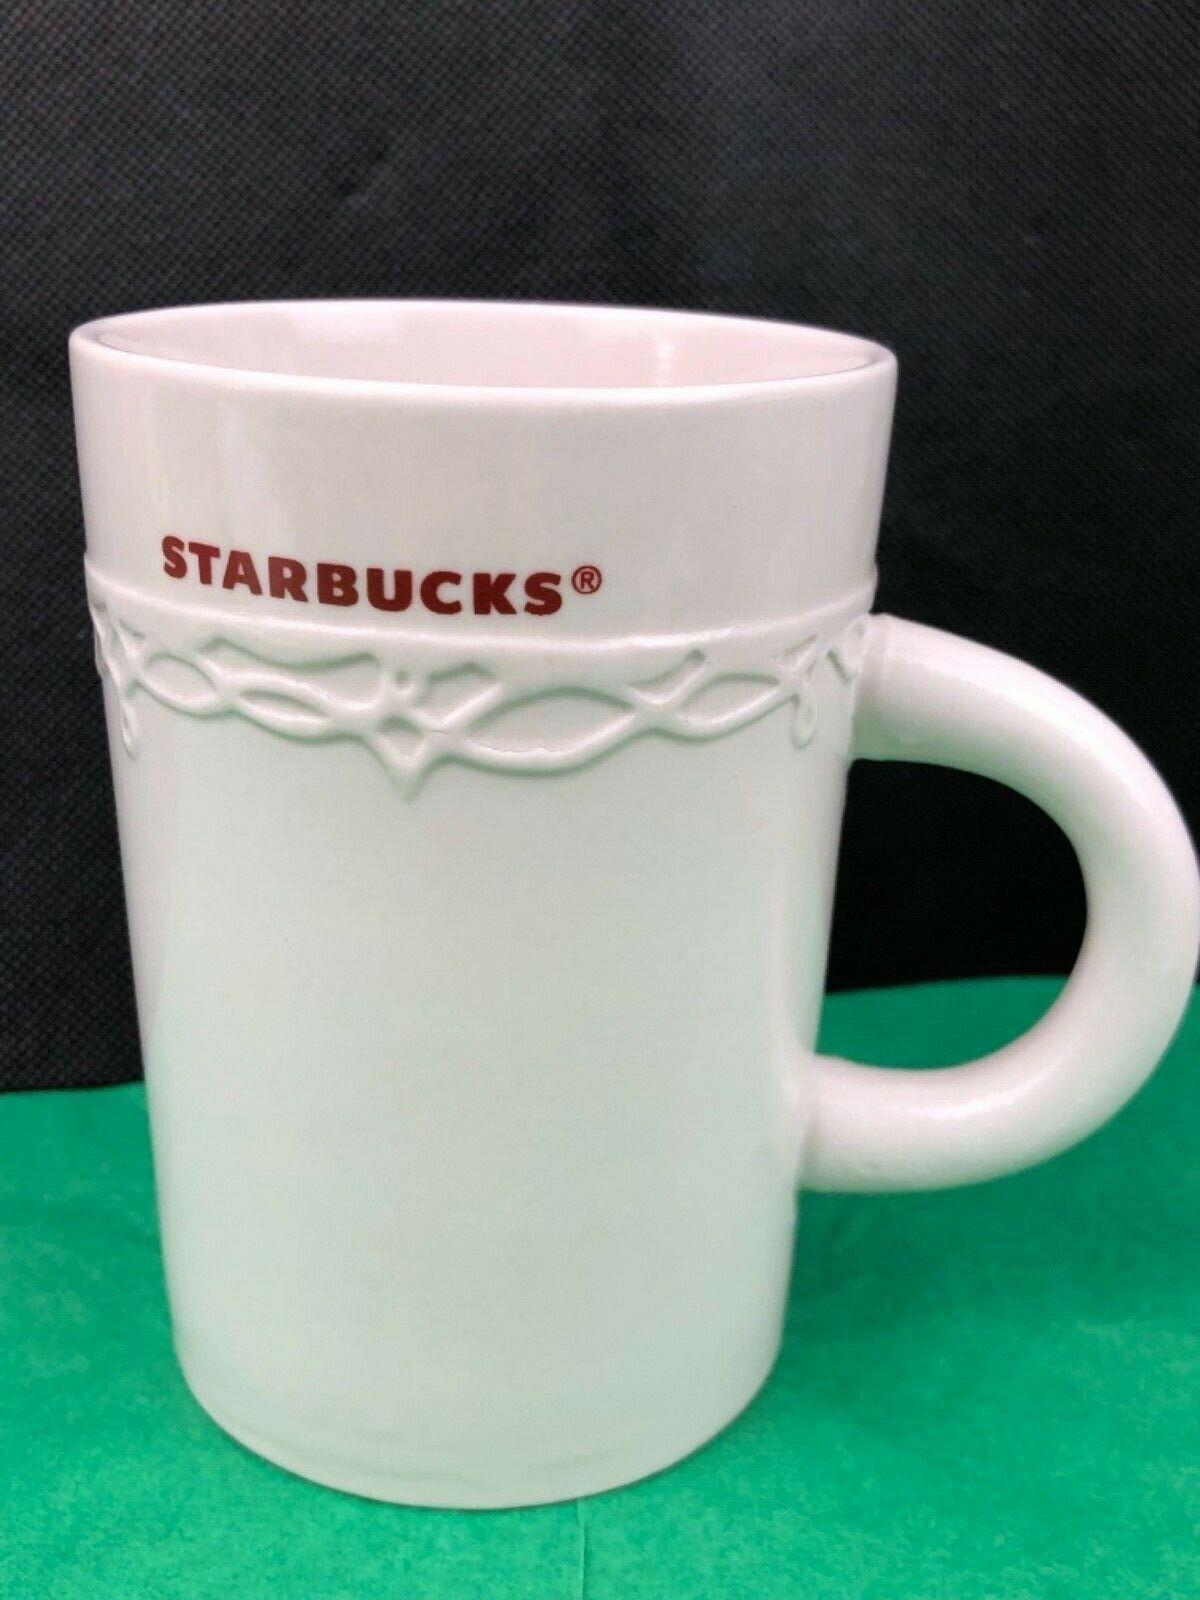 Starbucks 2010 Ceramic Coffee Mug Cup Embossed Design 10 Oz White Ebay Mugs Starbucks Mugs Starbucks